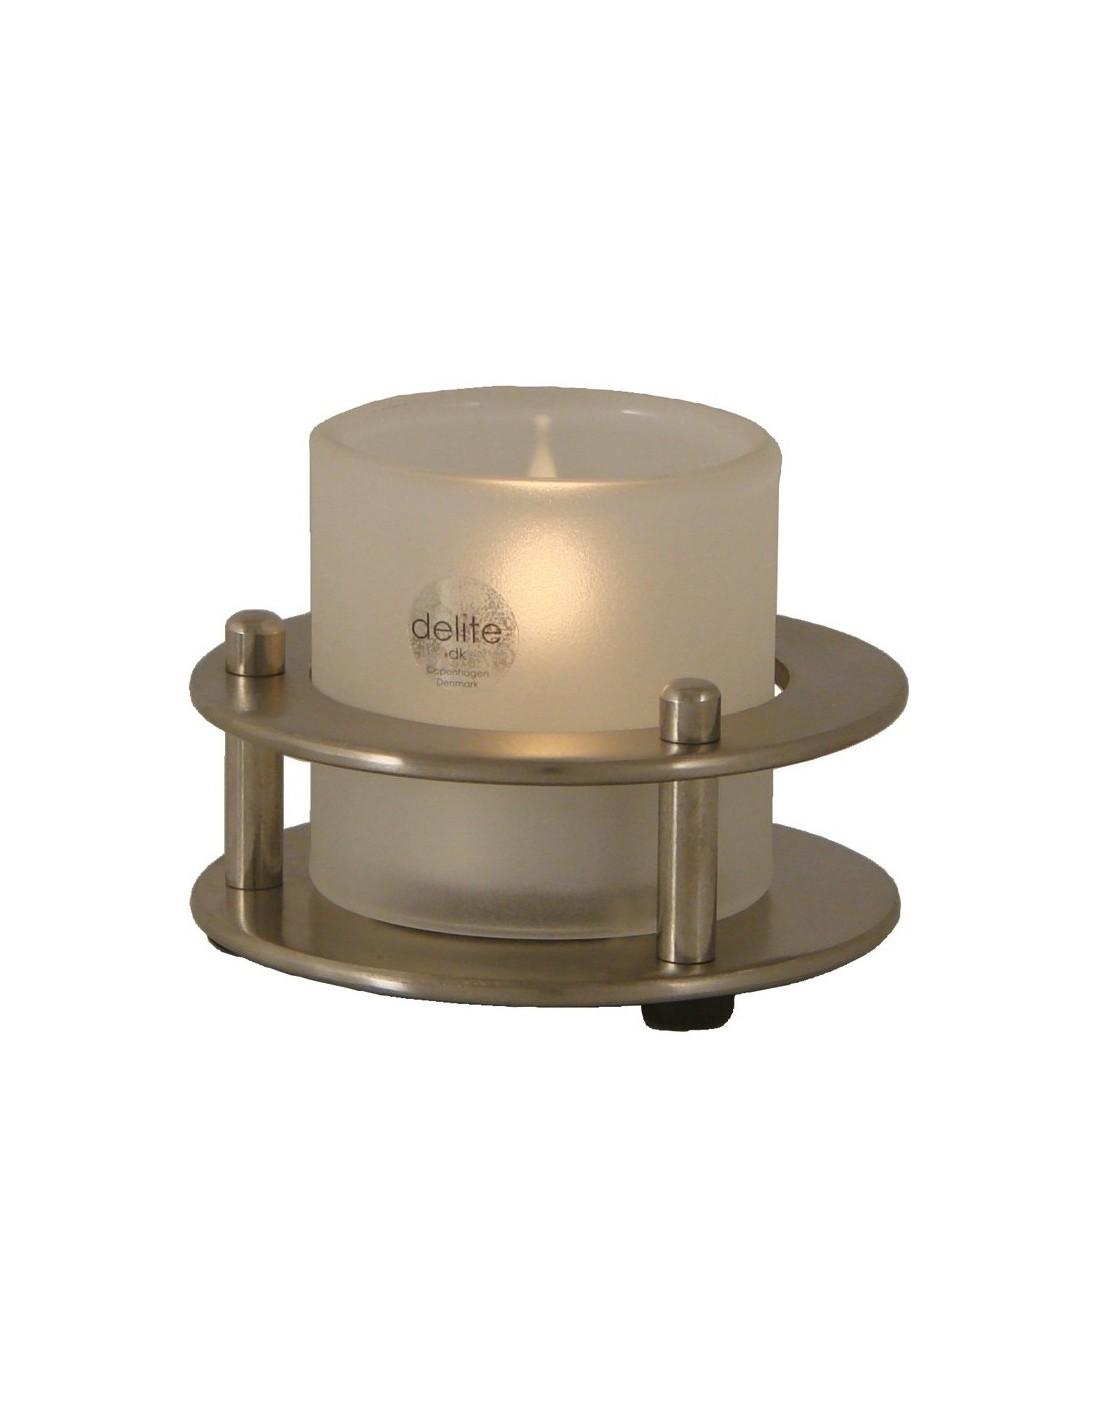 Porthole - Waxinelichthouder - Geborsteld RVS - Delite - Lampen - 603303